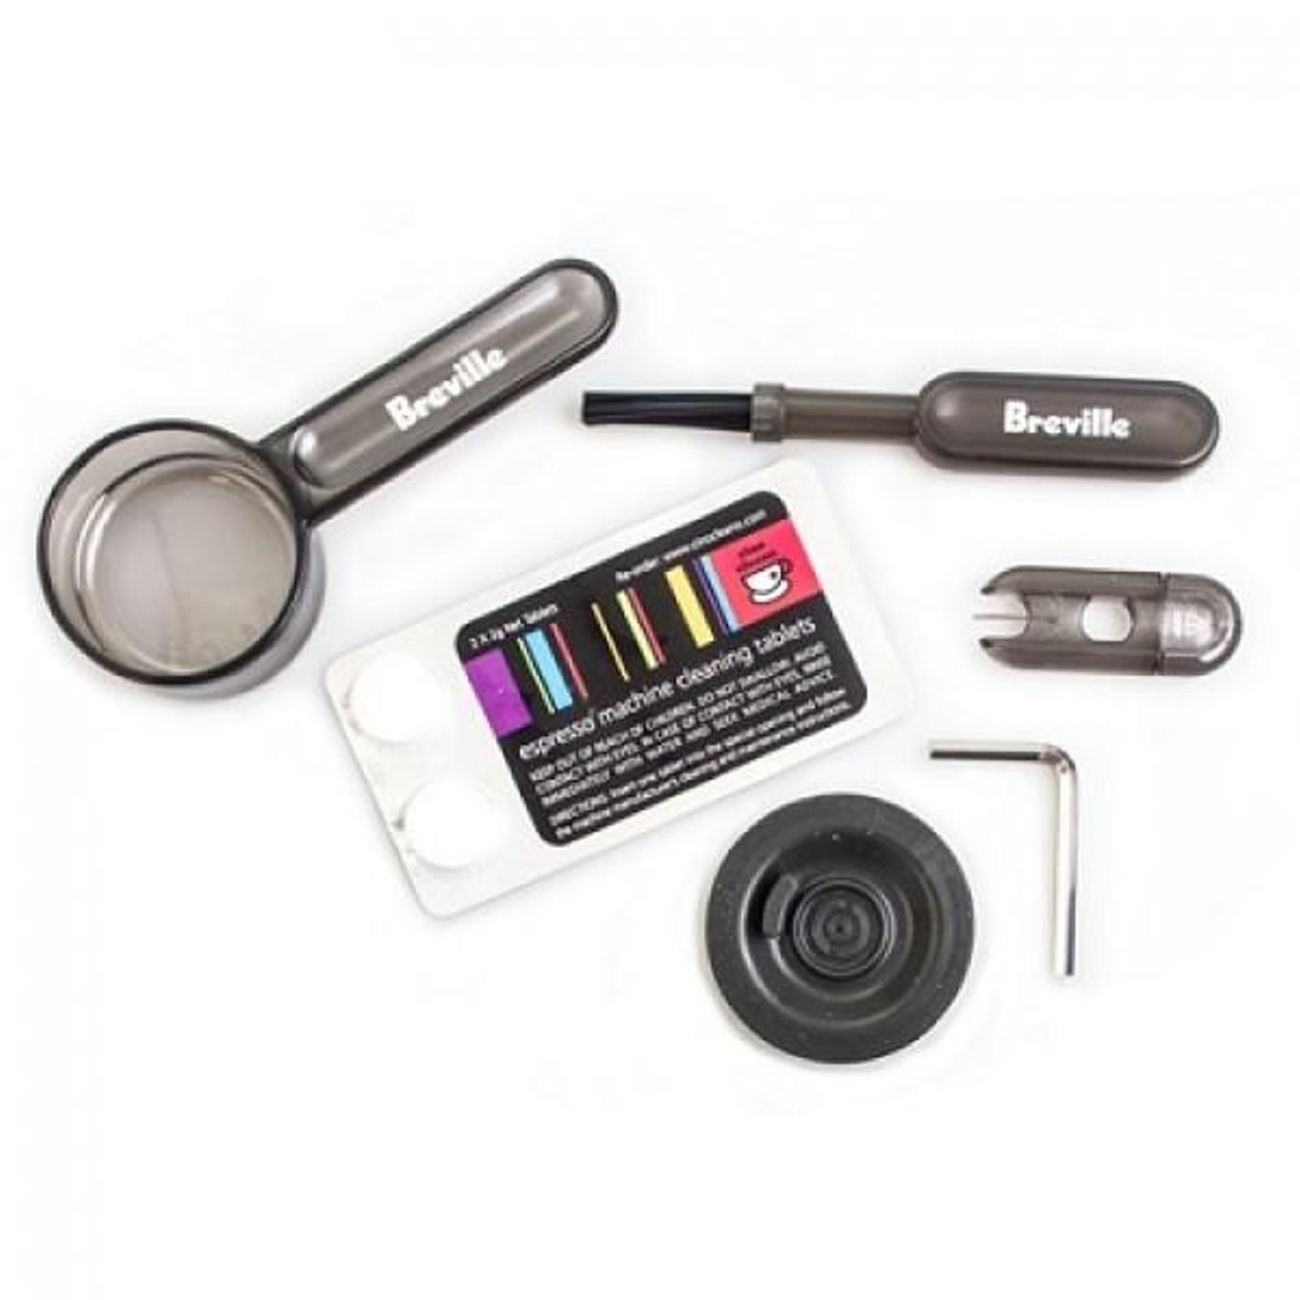 Eco Milk X2 Breville Cleaning Kit Set BWF100 X1 Tamp Mat X1 Descaler X2